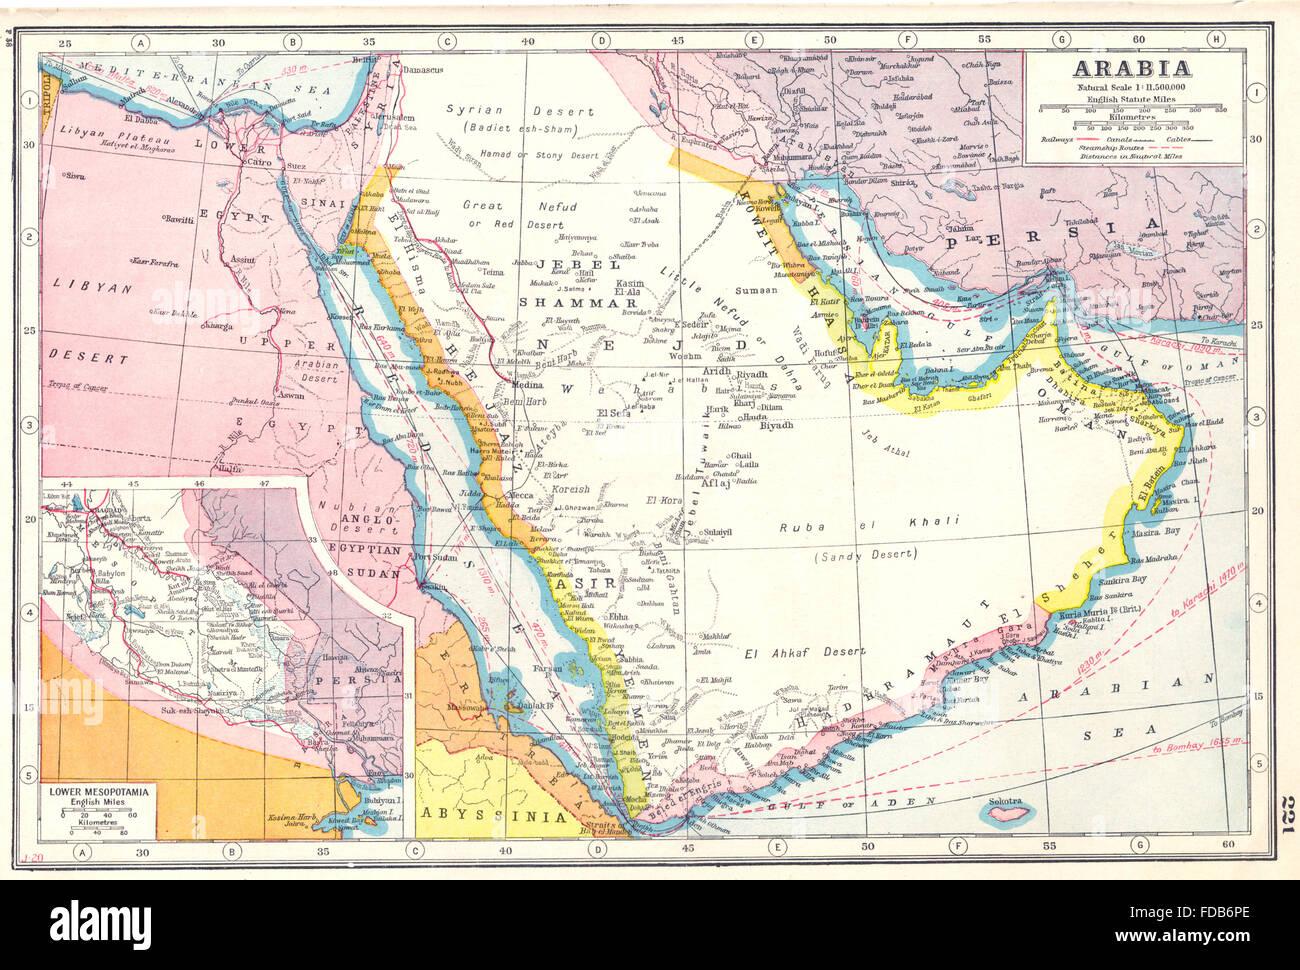 arabia saudi arabia uae oman yemen inset lower mesopotamia iraq 1920 map